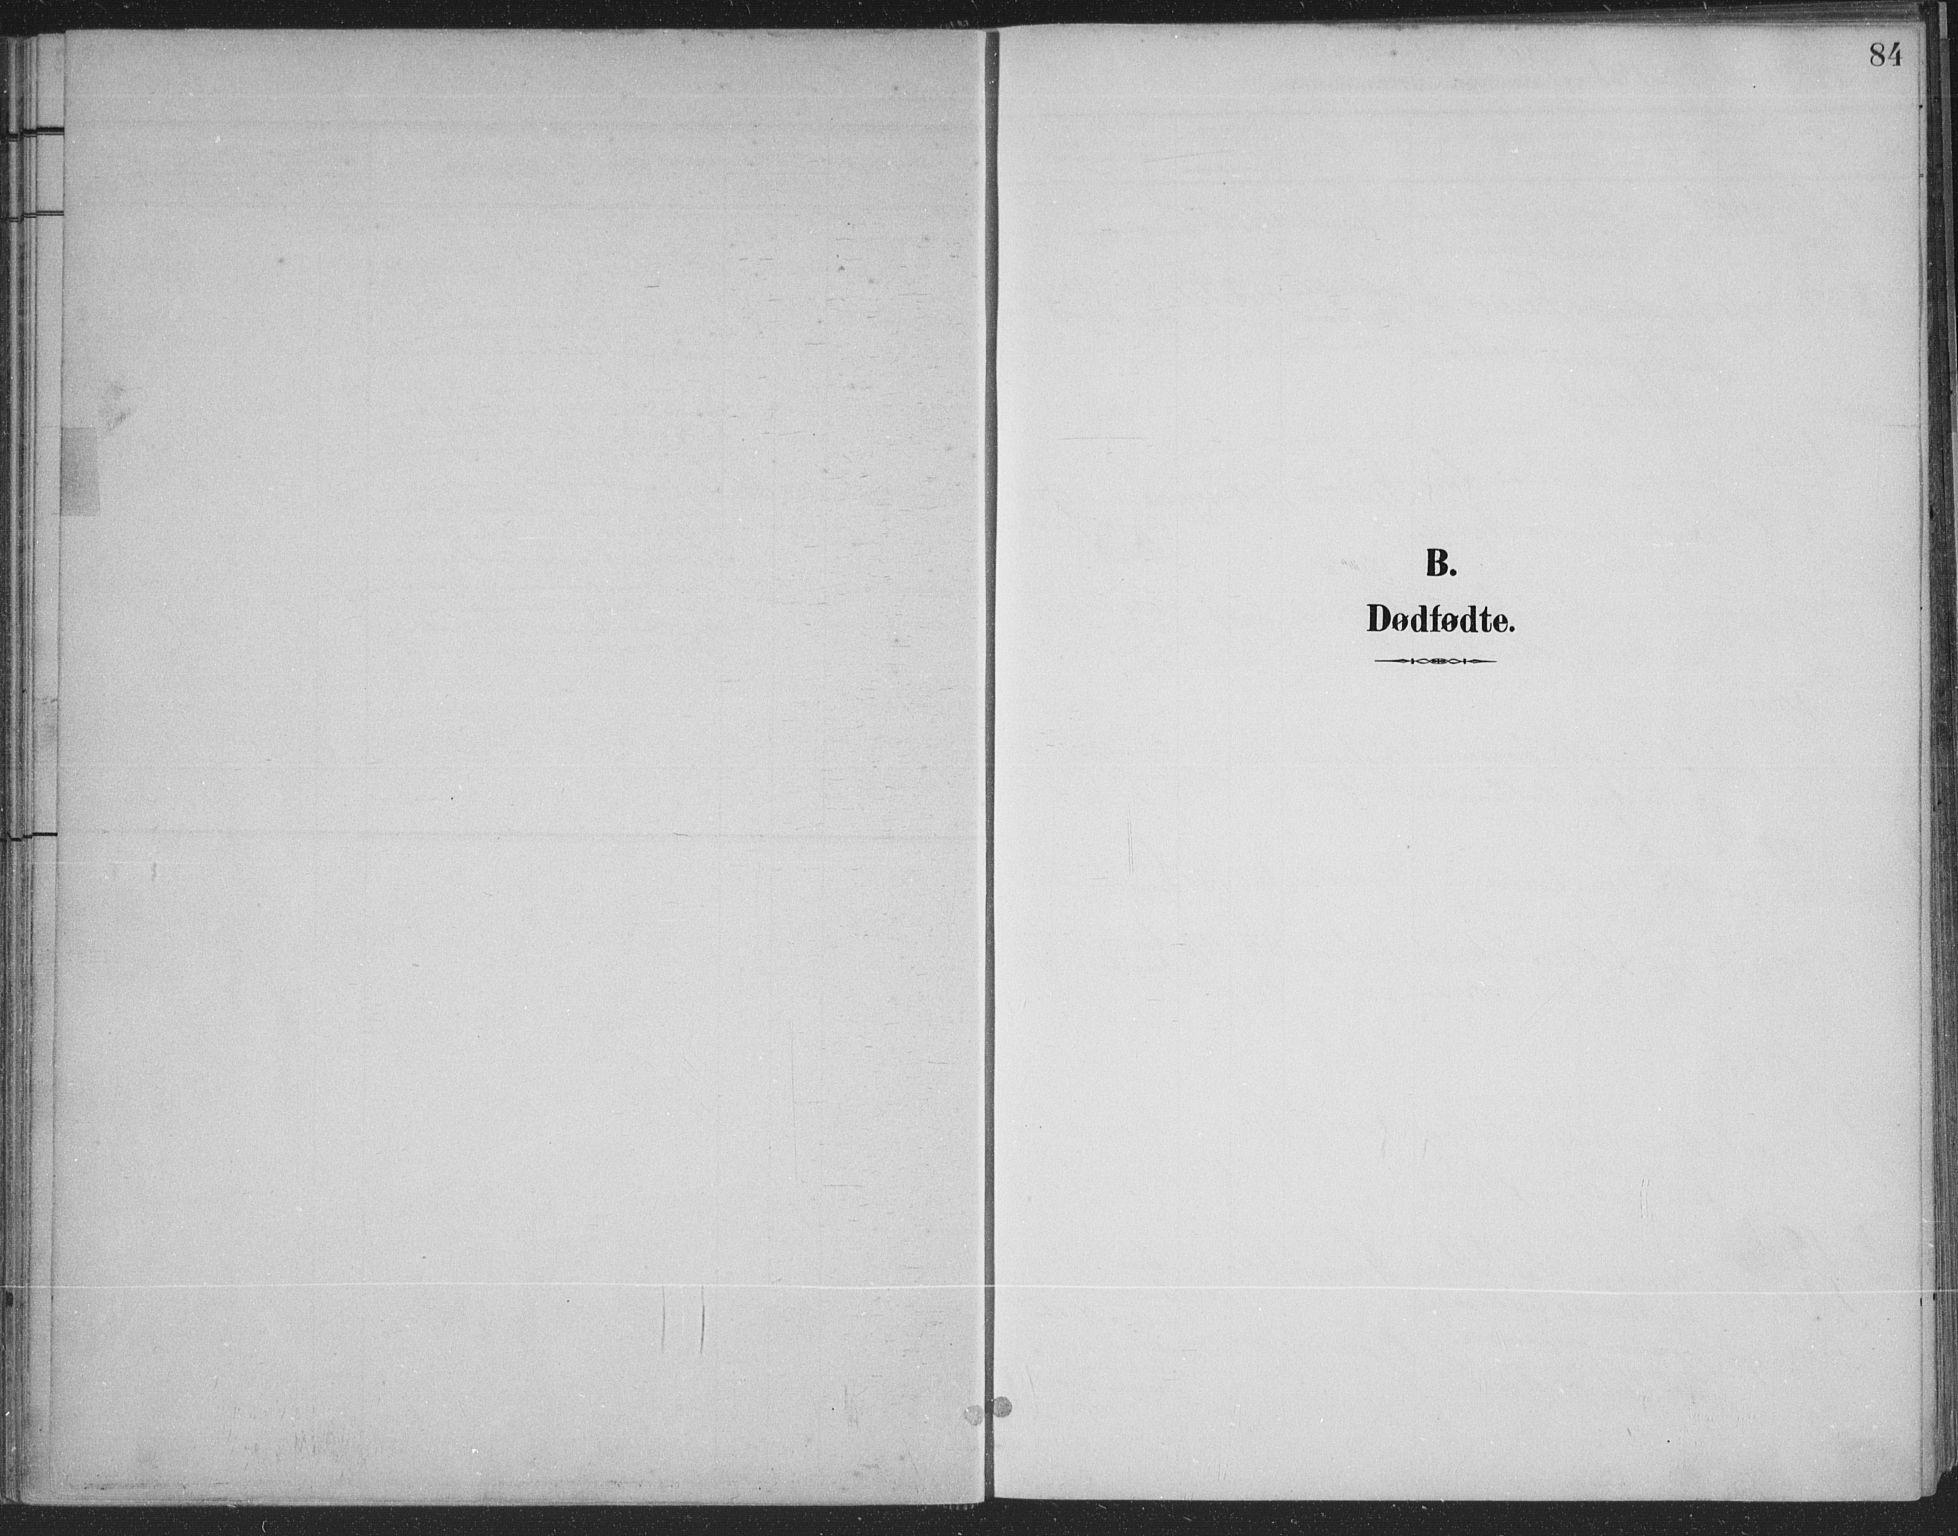 SAH, Østre Gausdal prestekontor, Ministerialbok nr. 4, 1898-1914, s. 84